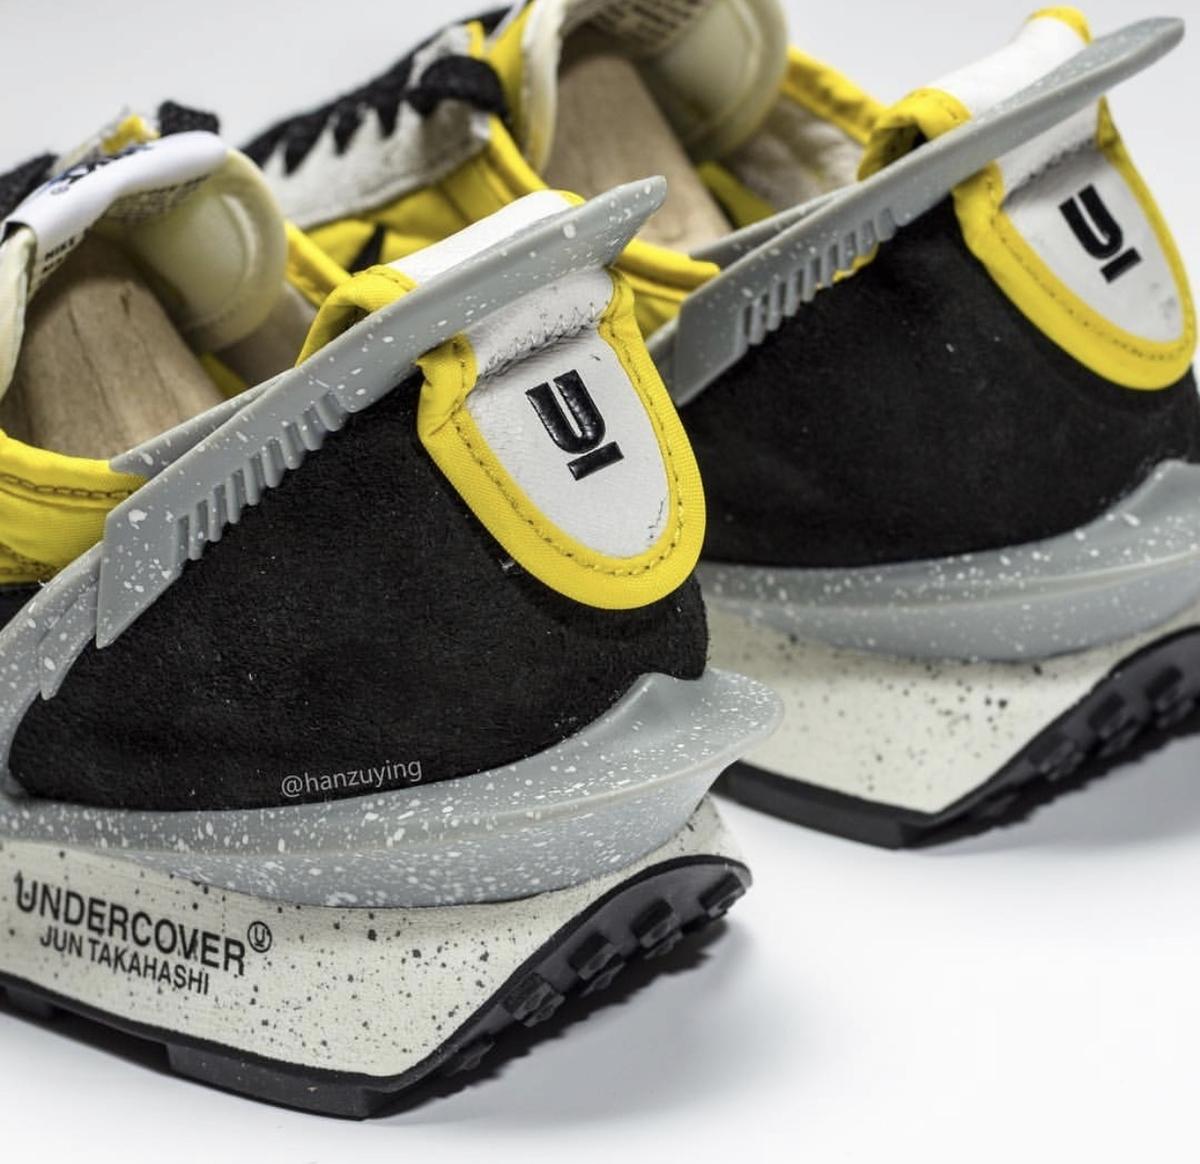 f:id:sneakerscaffetokyo:20190714095920j:plain